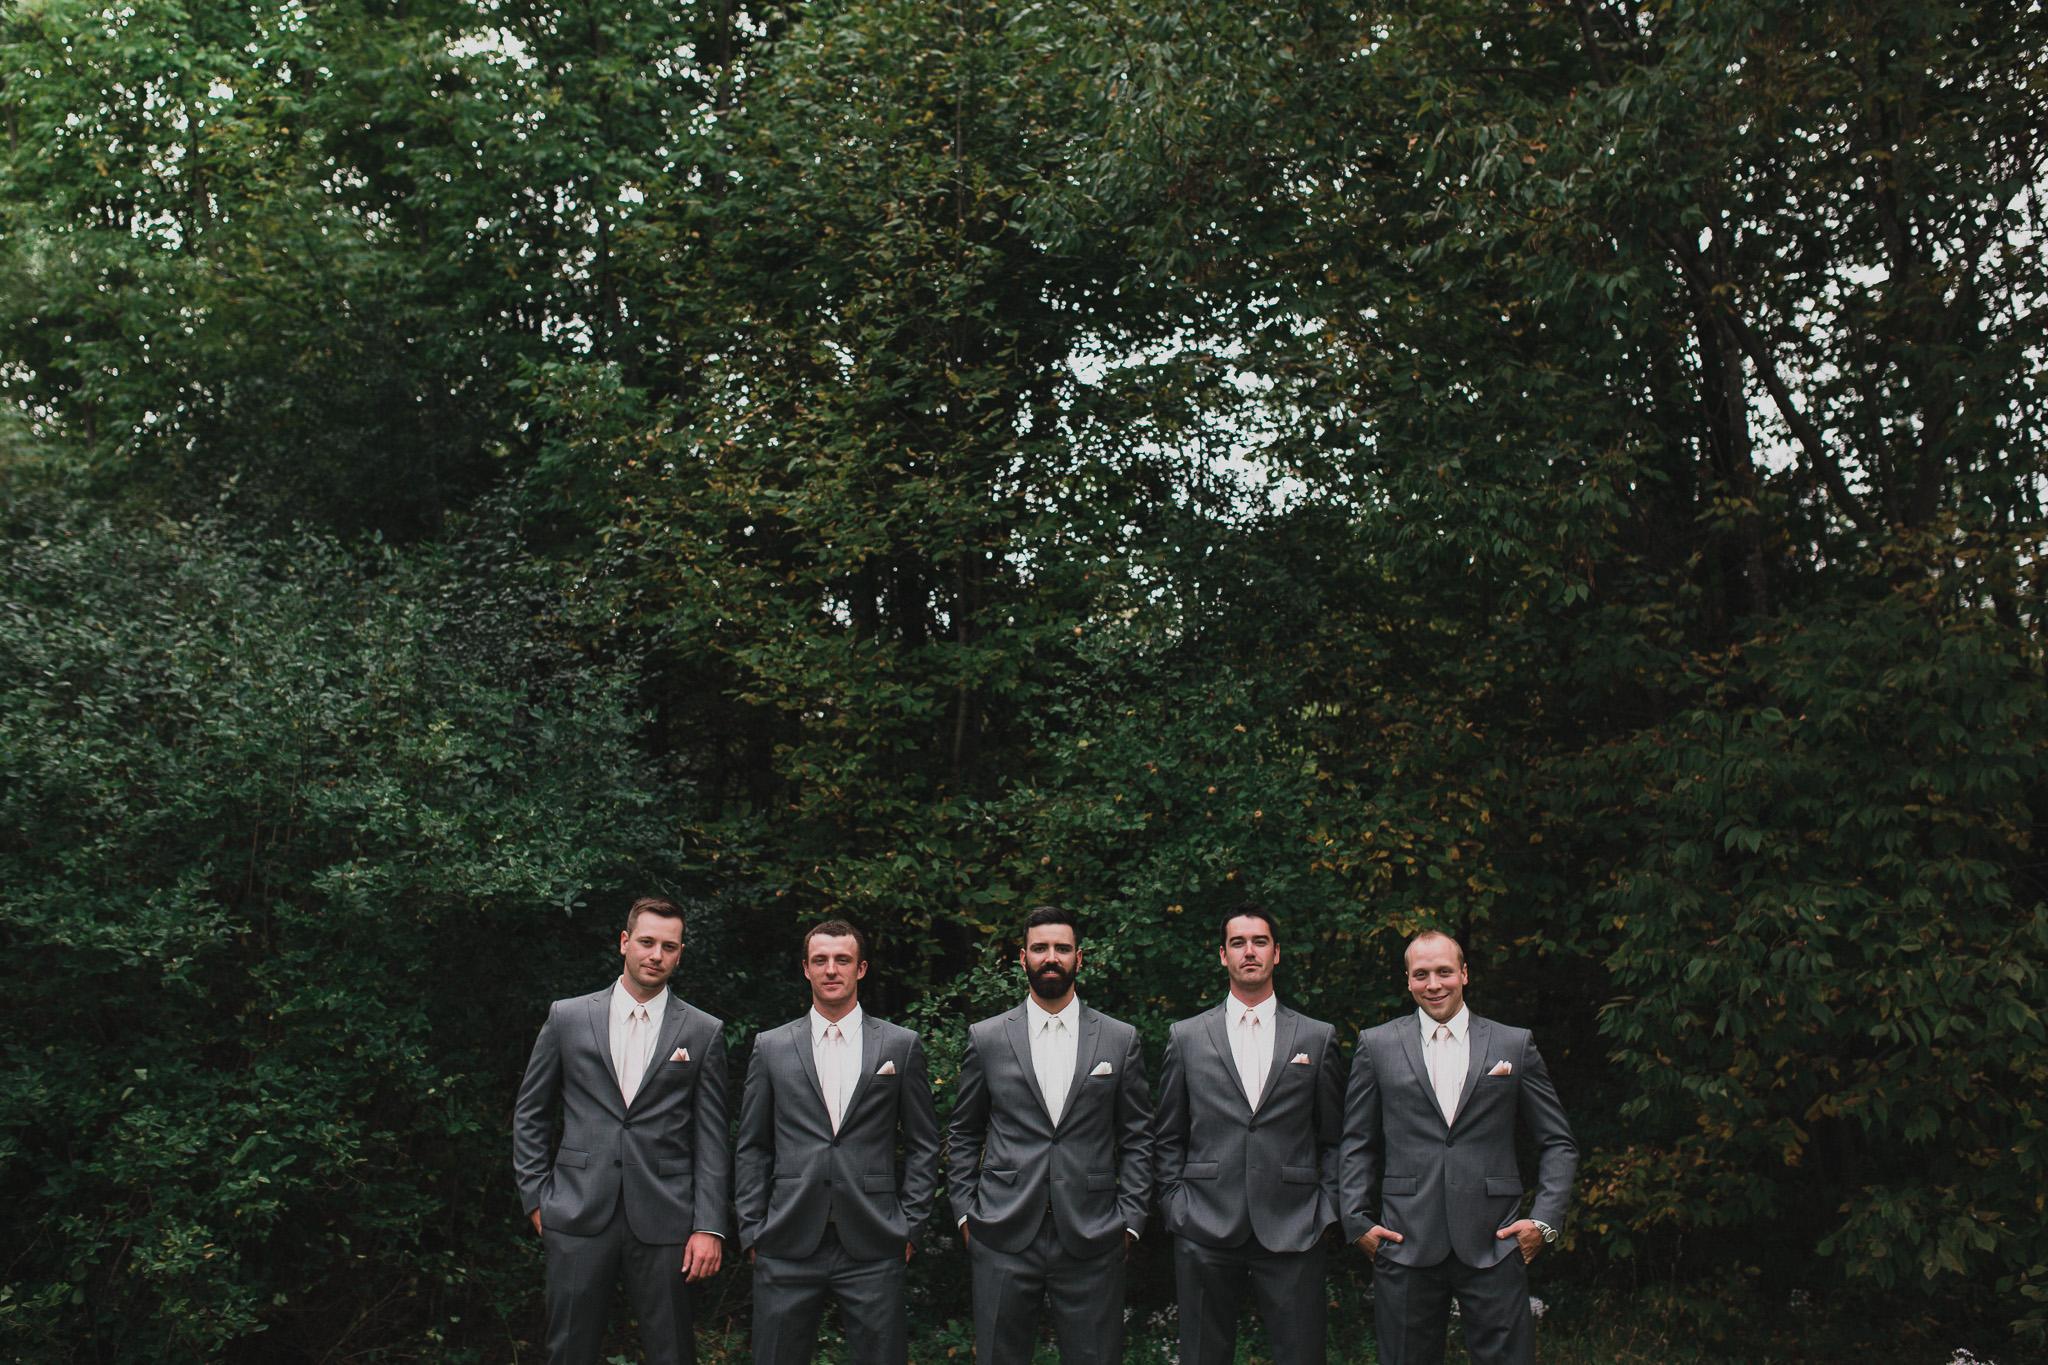 Eastern Ontario Professional Wedding Photography